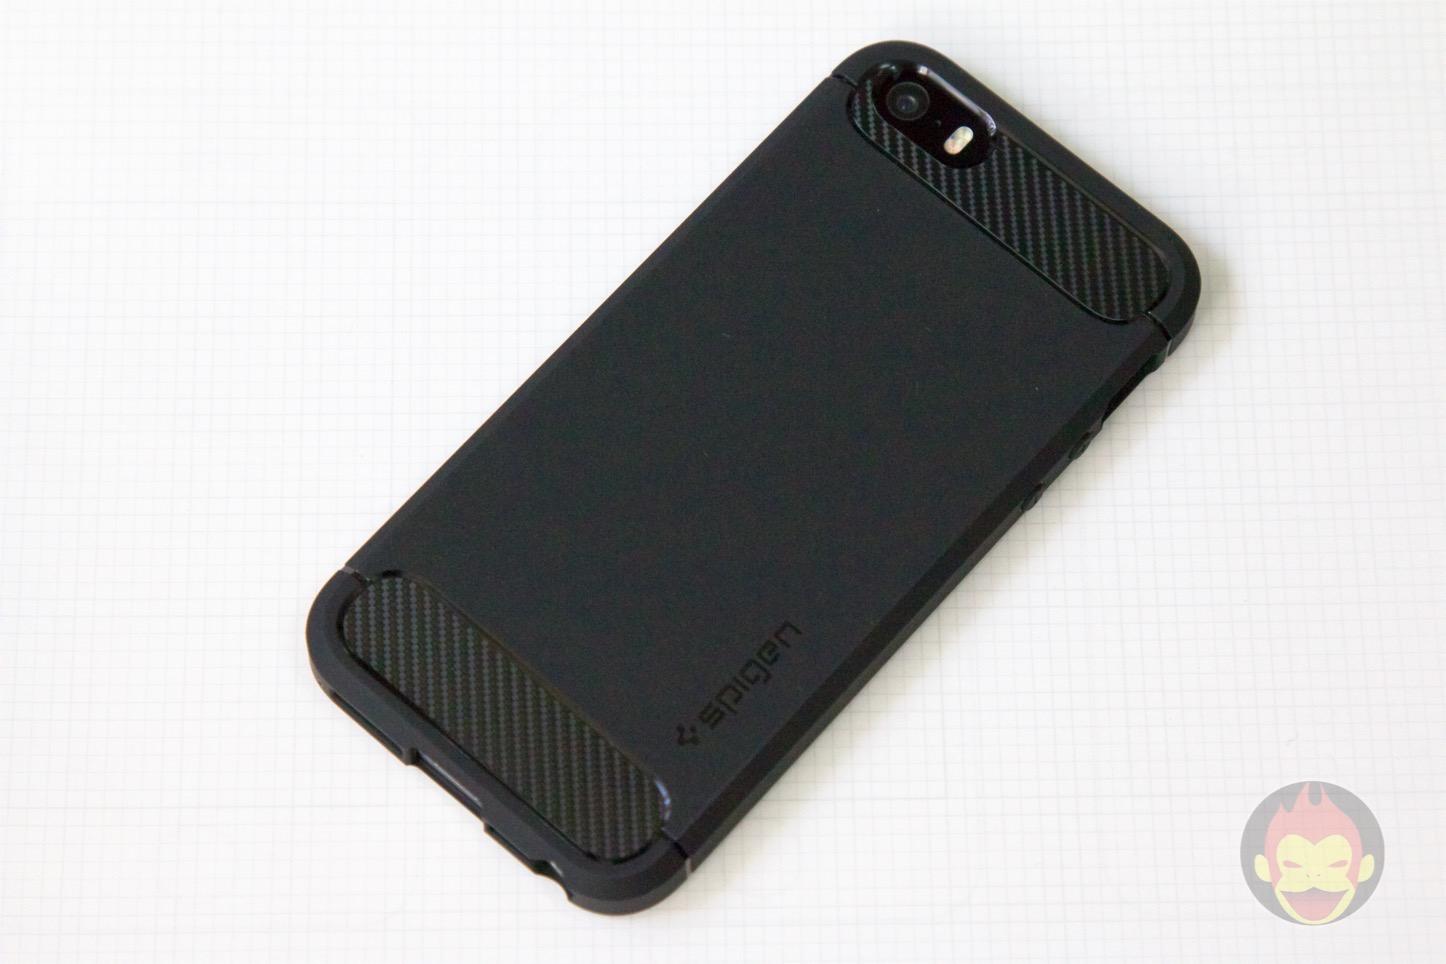 Spigen-Rugged-Case-iPhone-07.jpg